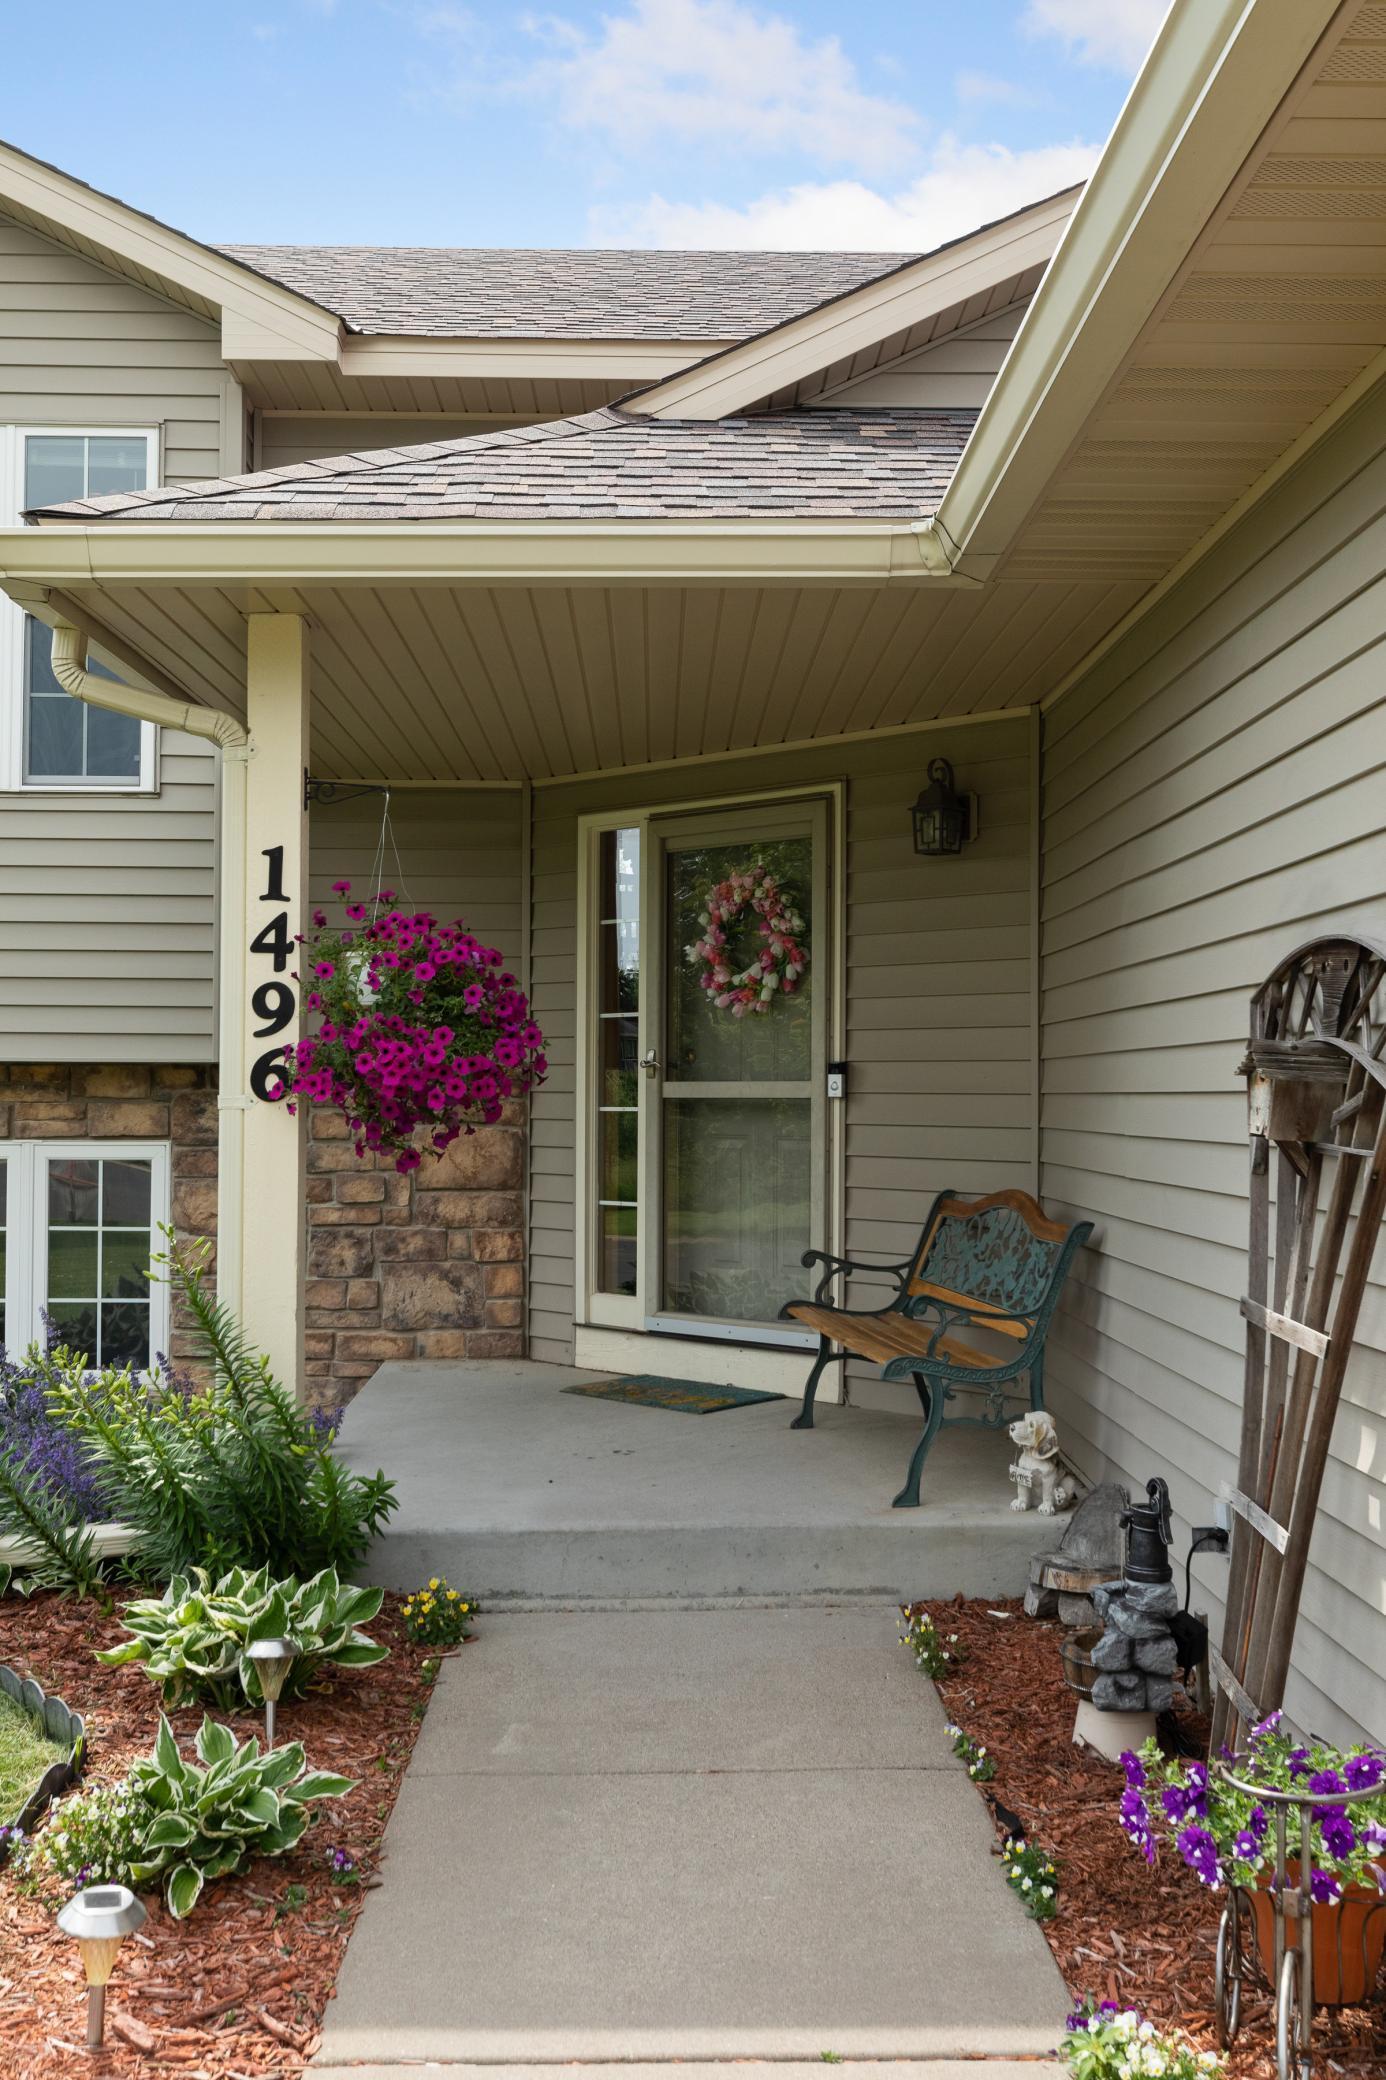 1496 Mallard Property Photo - Baldwin, WI real estate listing